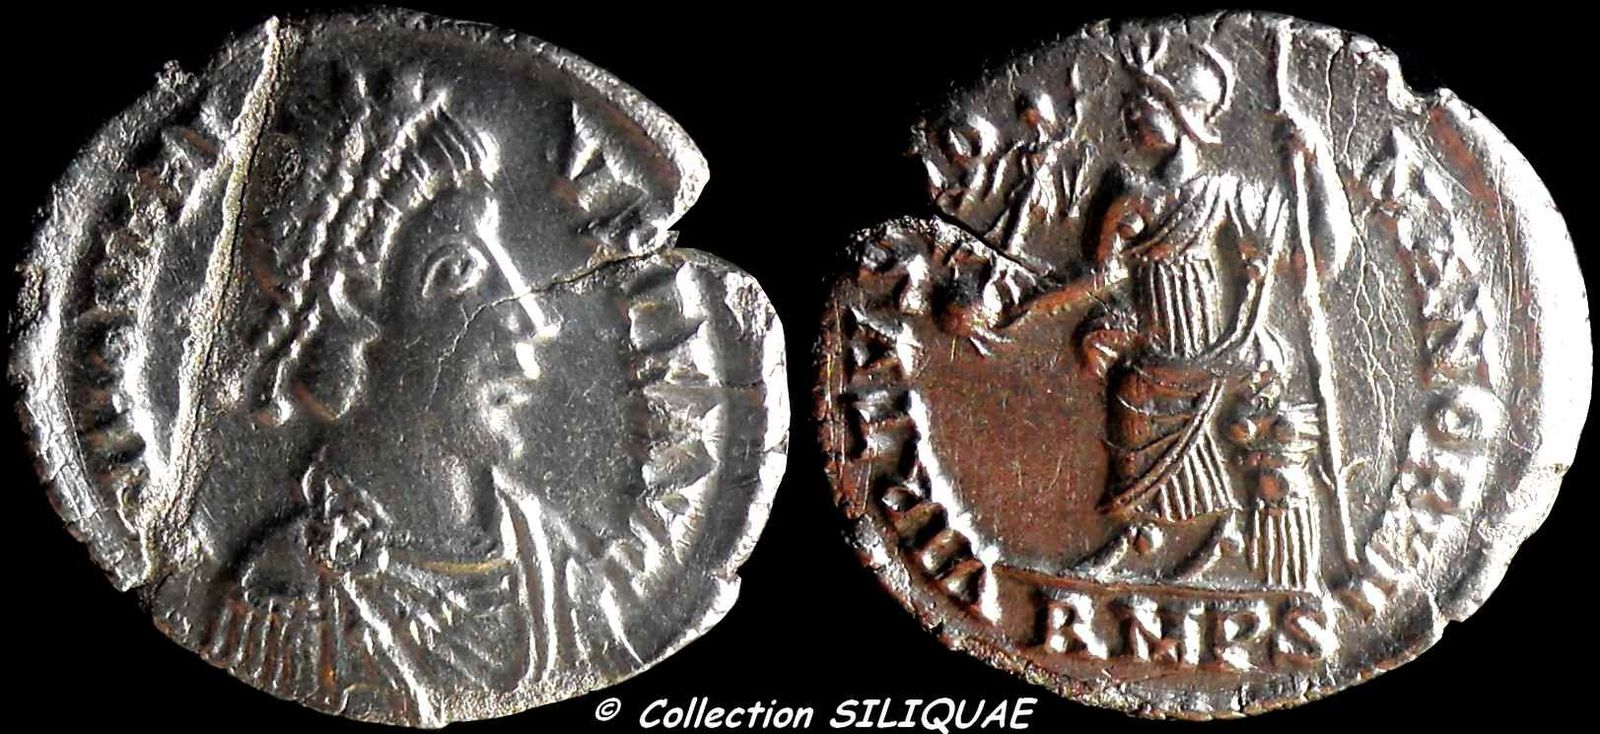 Collection Siliquae - Page 6 HONORIUS-RIC1267